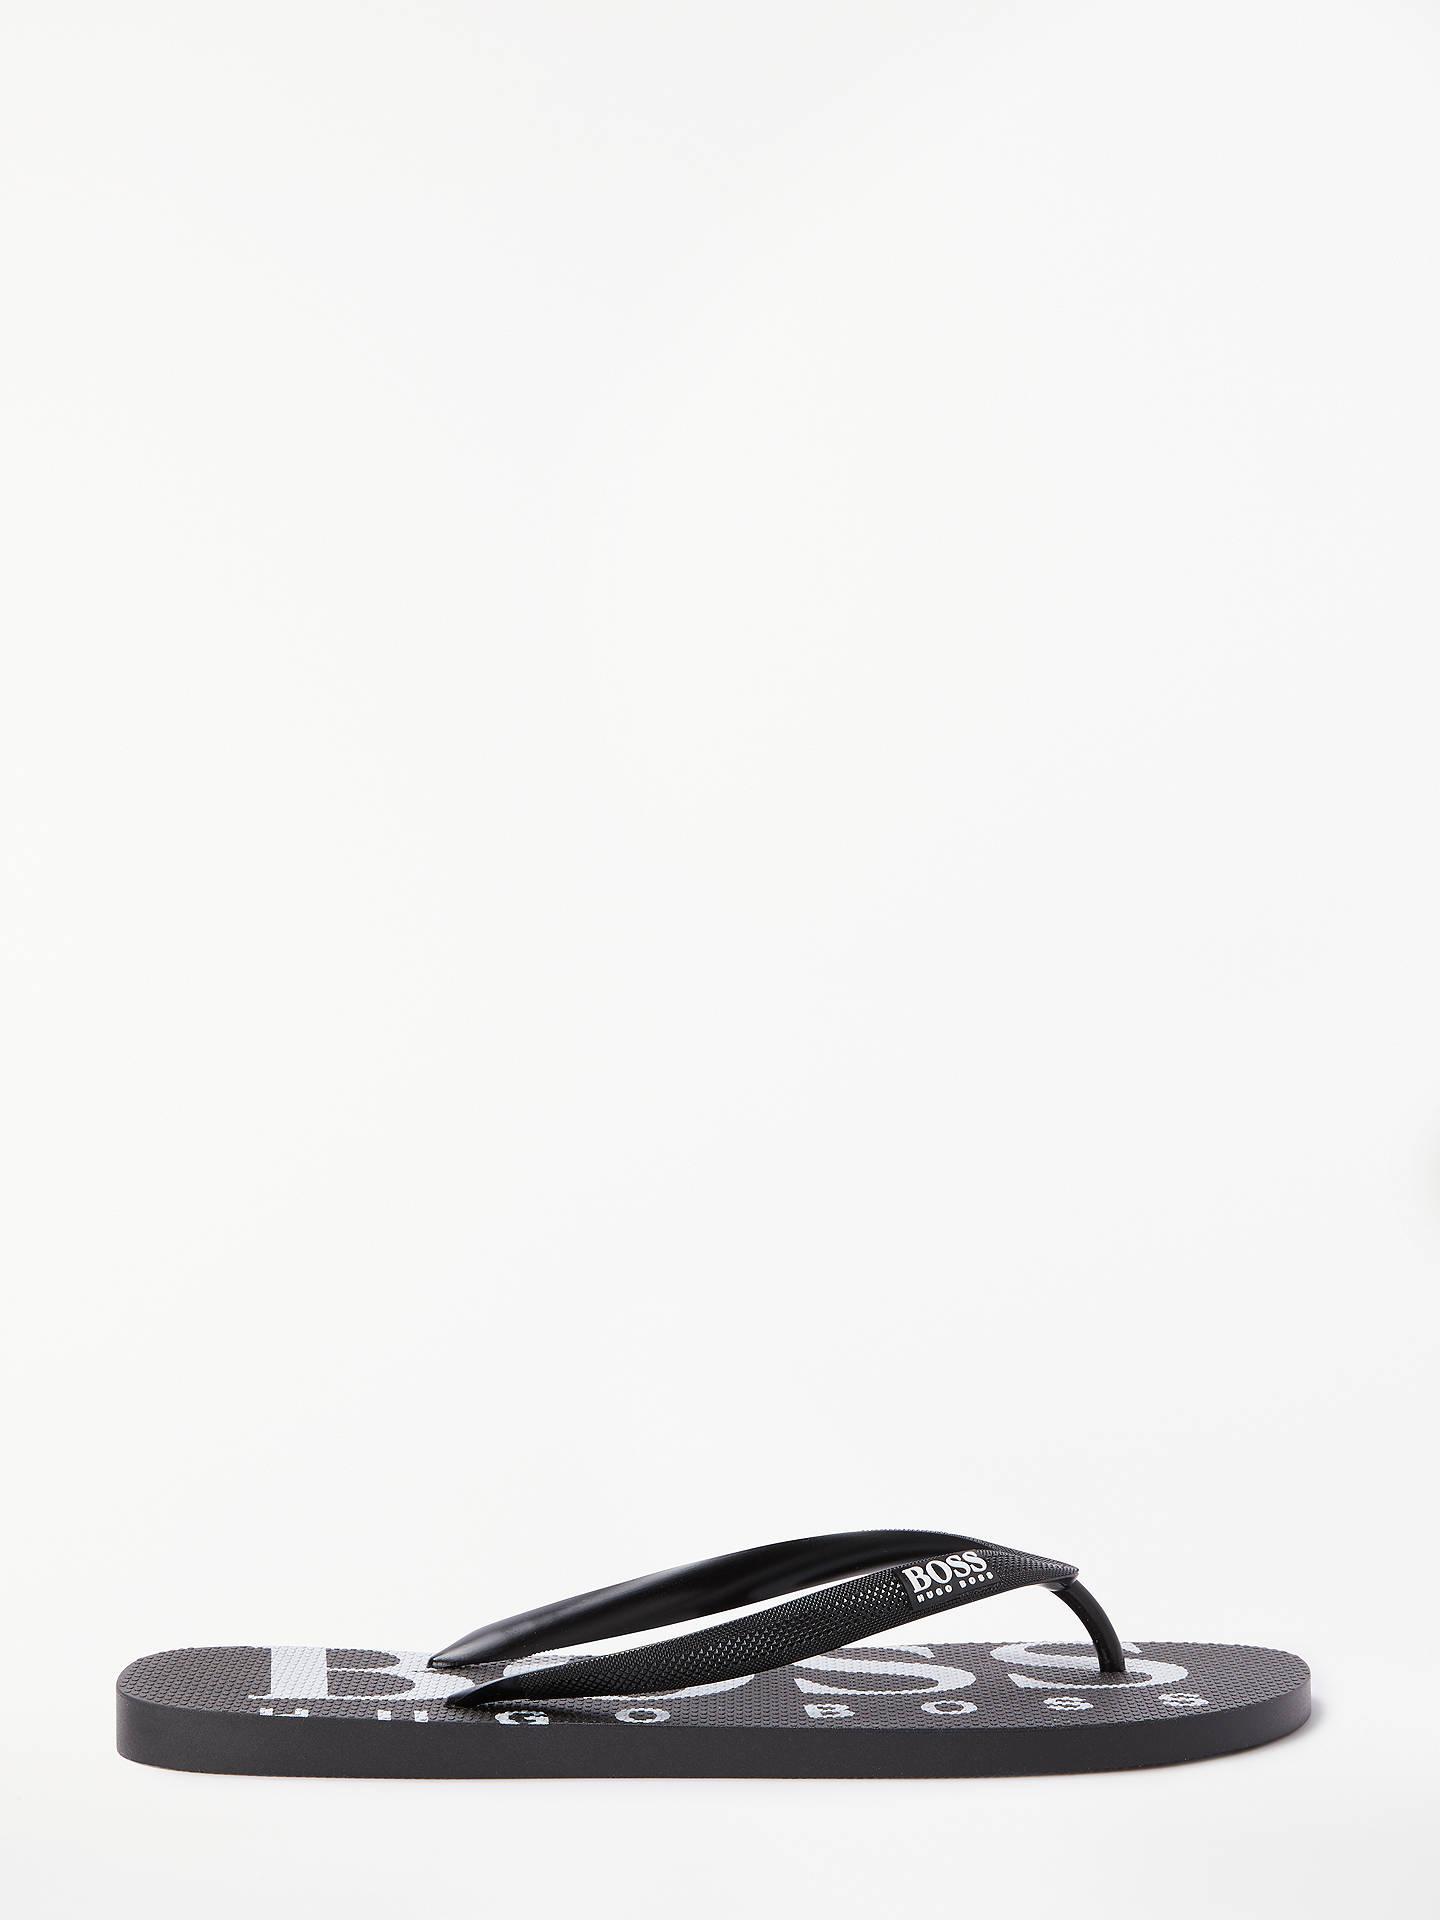 9c2b6842ef921 Buy BOSS Wave Contrast Logo Rubber Flip Flops